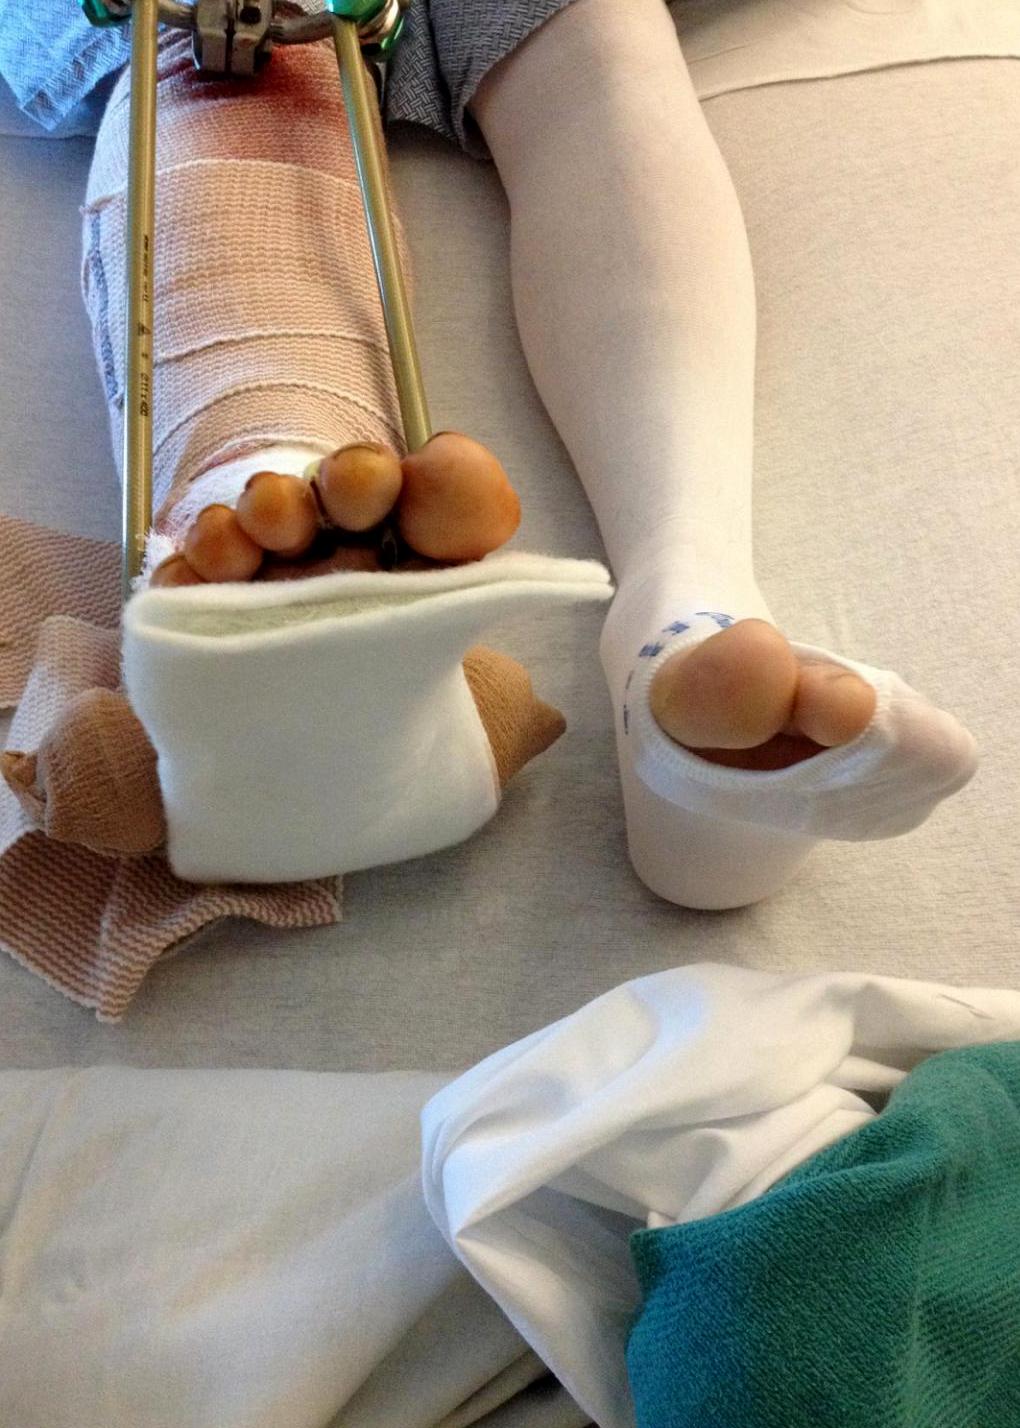 Hyrum Zerkle's leg after first surgery, Valley View Medical Center, Cedar City, Utah, March 27, 2015 | Photo courtesy of Hyrum Zerkle, St. George News